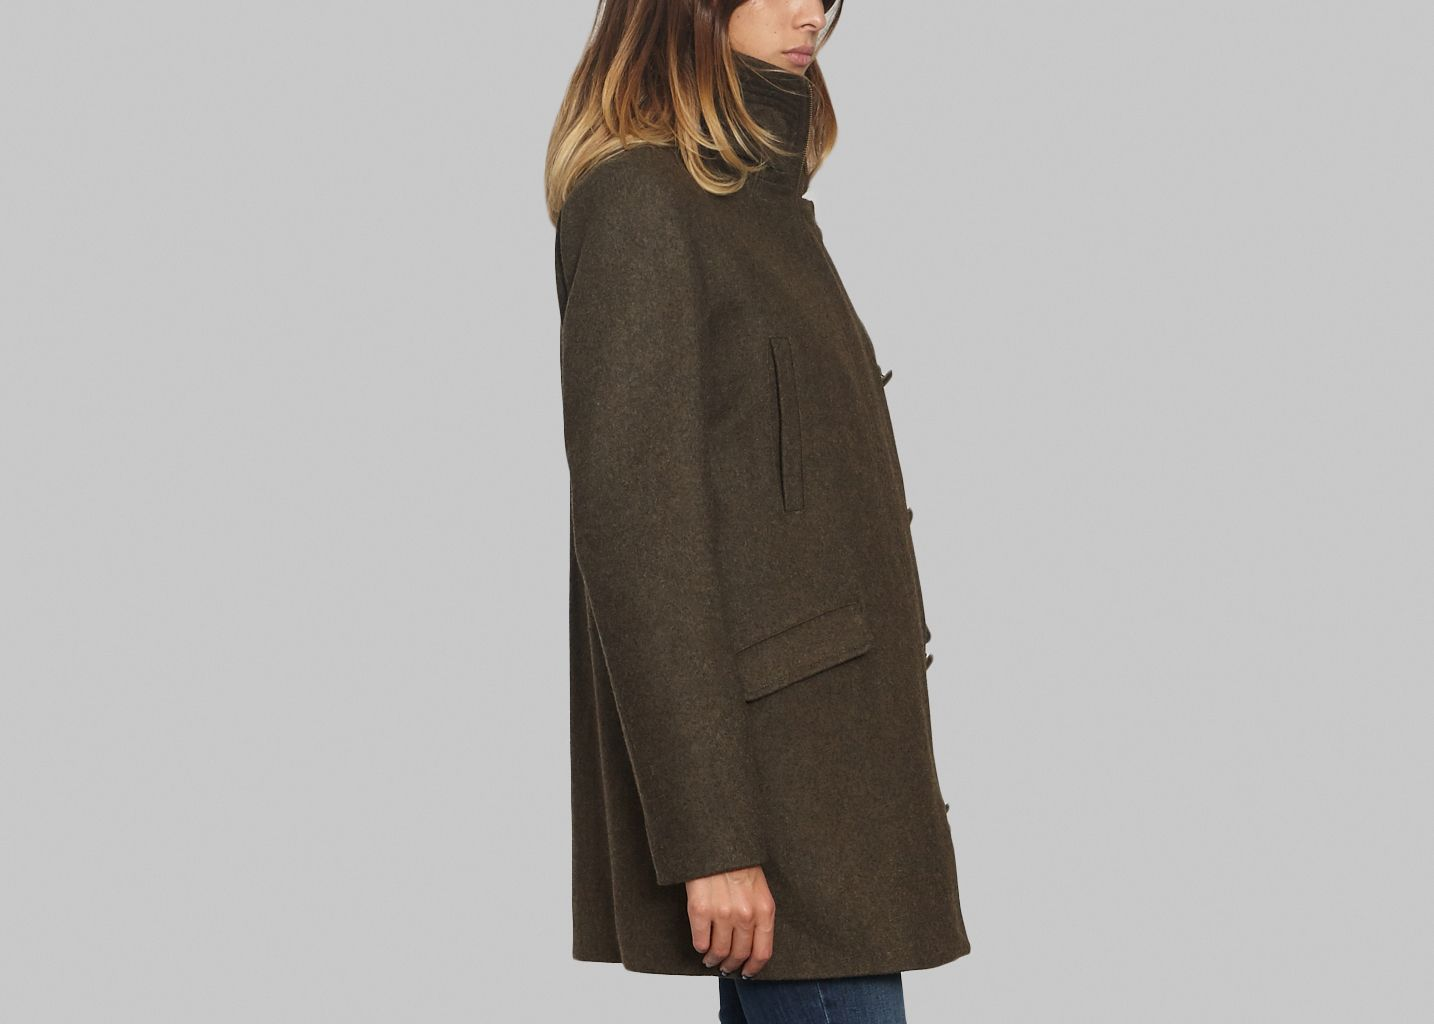 camp night coat sess n khaki on sale at lexception com